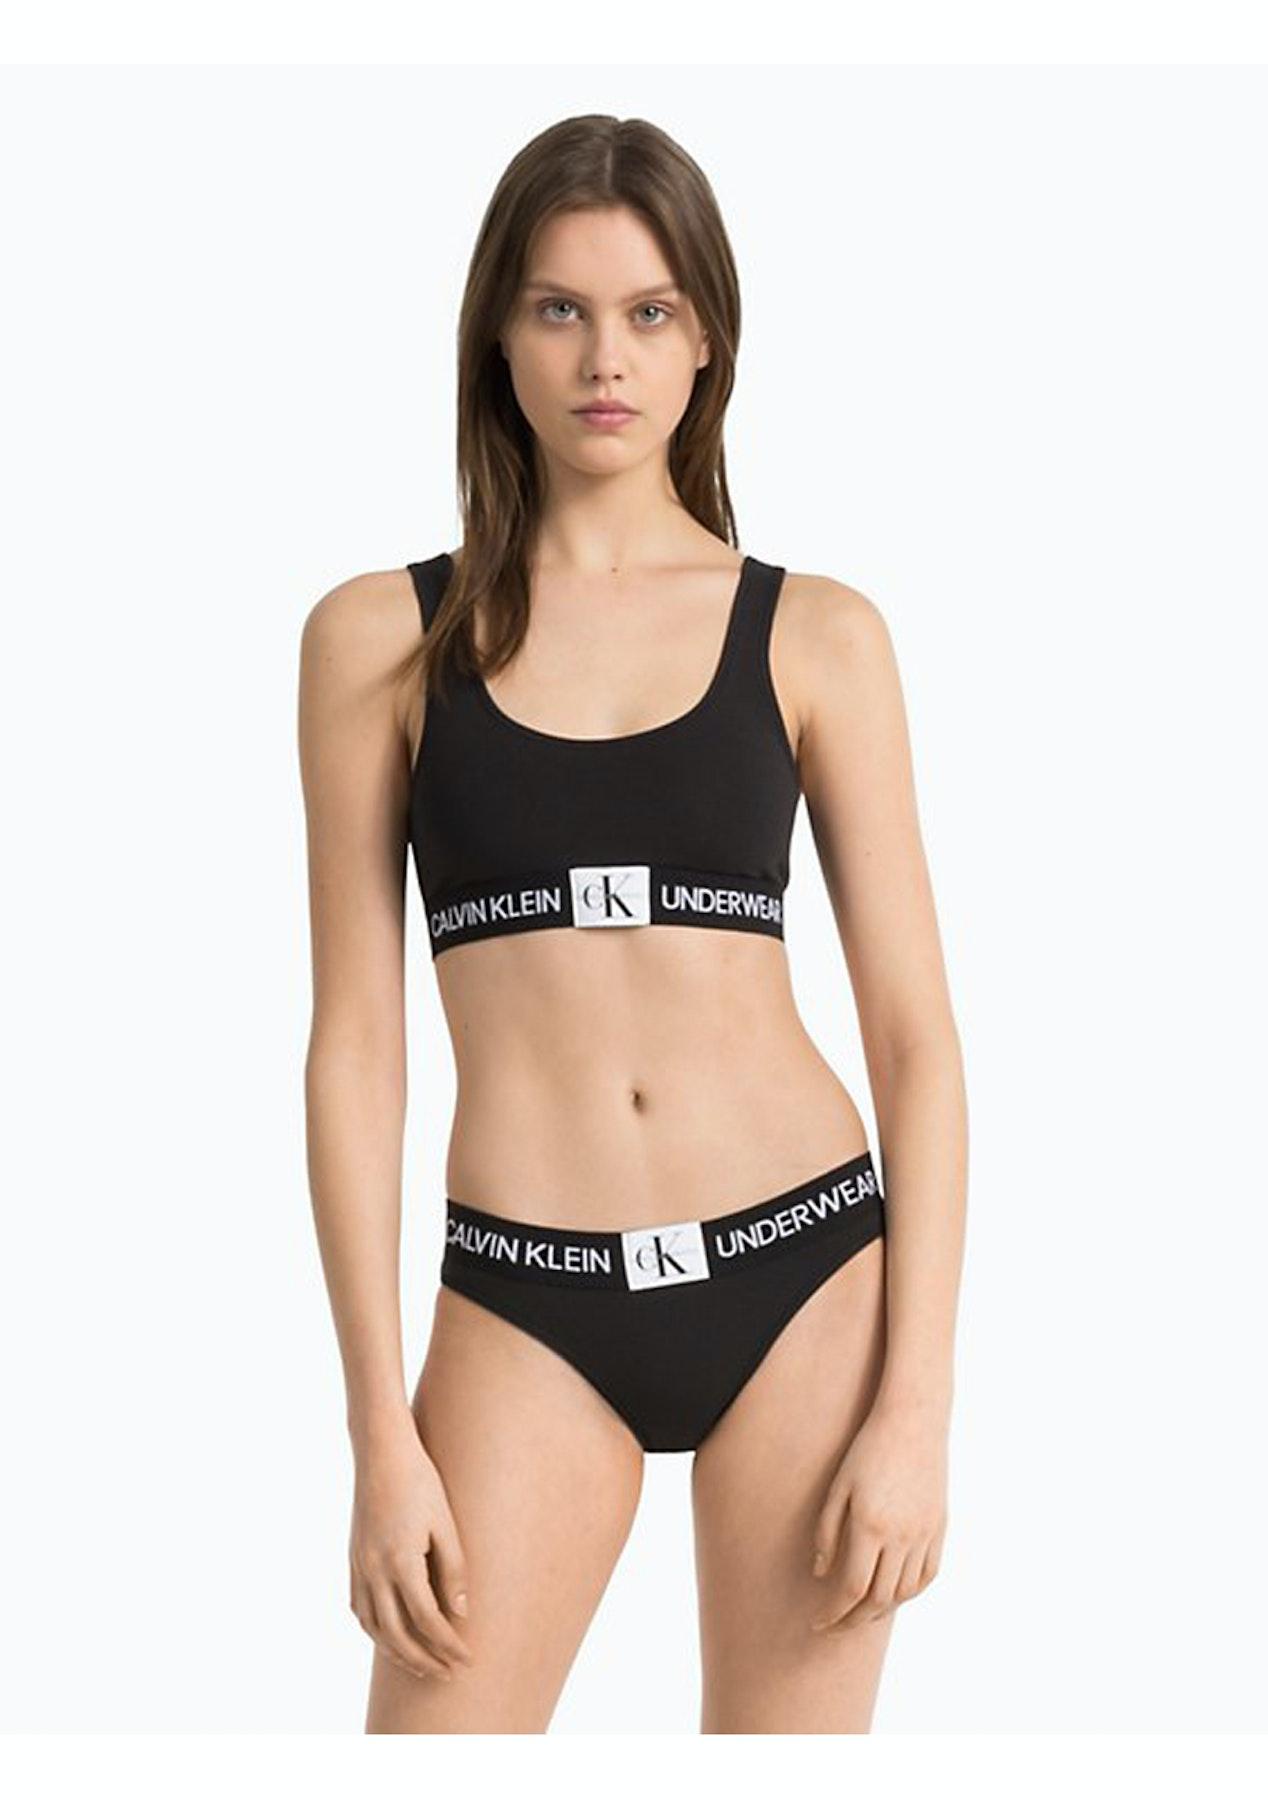 5dd9d7aaf3 Calvin Klein - Monogram Unlined Bralette - Black - Calvin Klein 3 Packs    More - Onceit